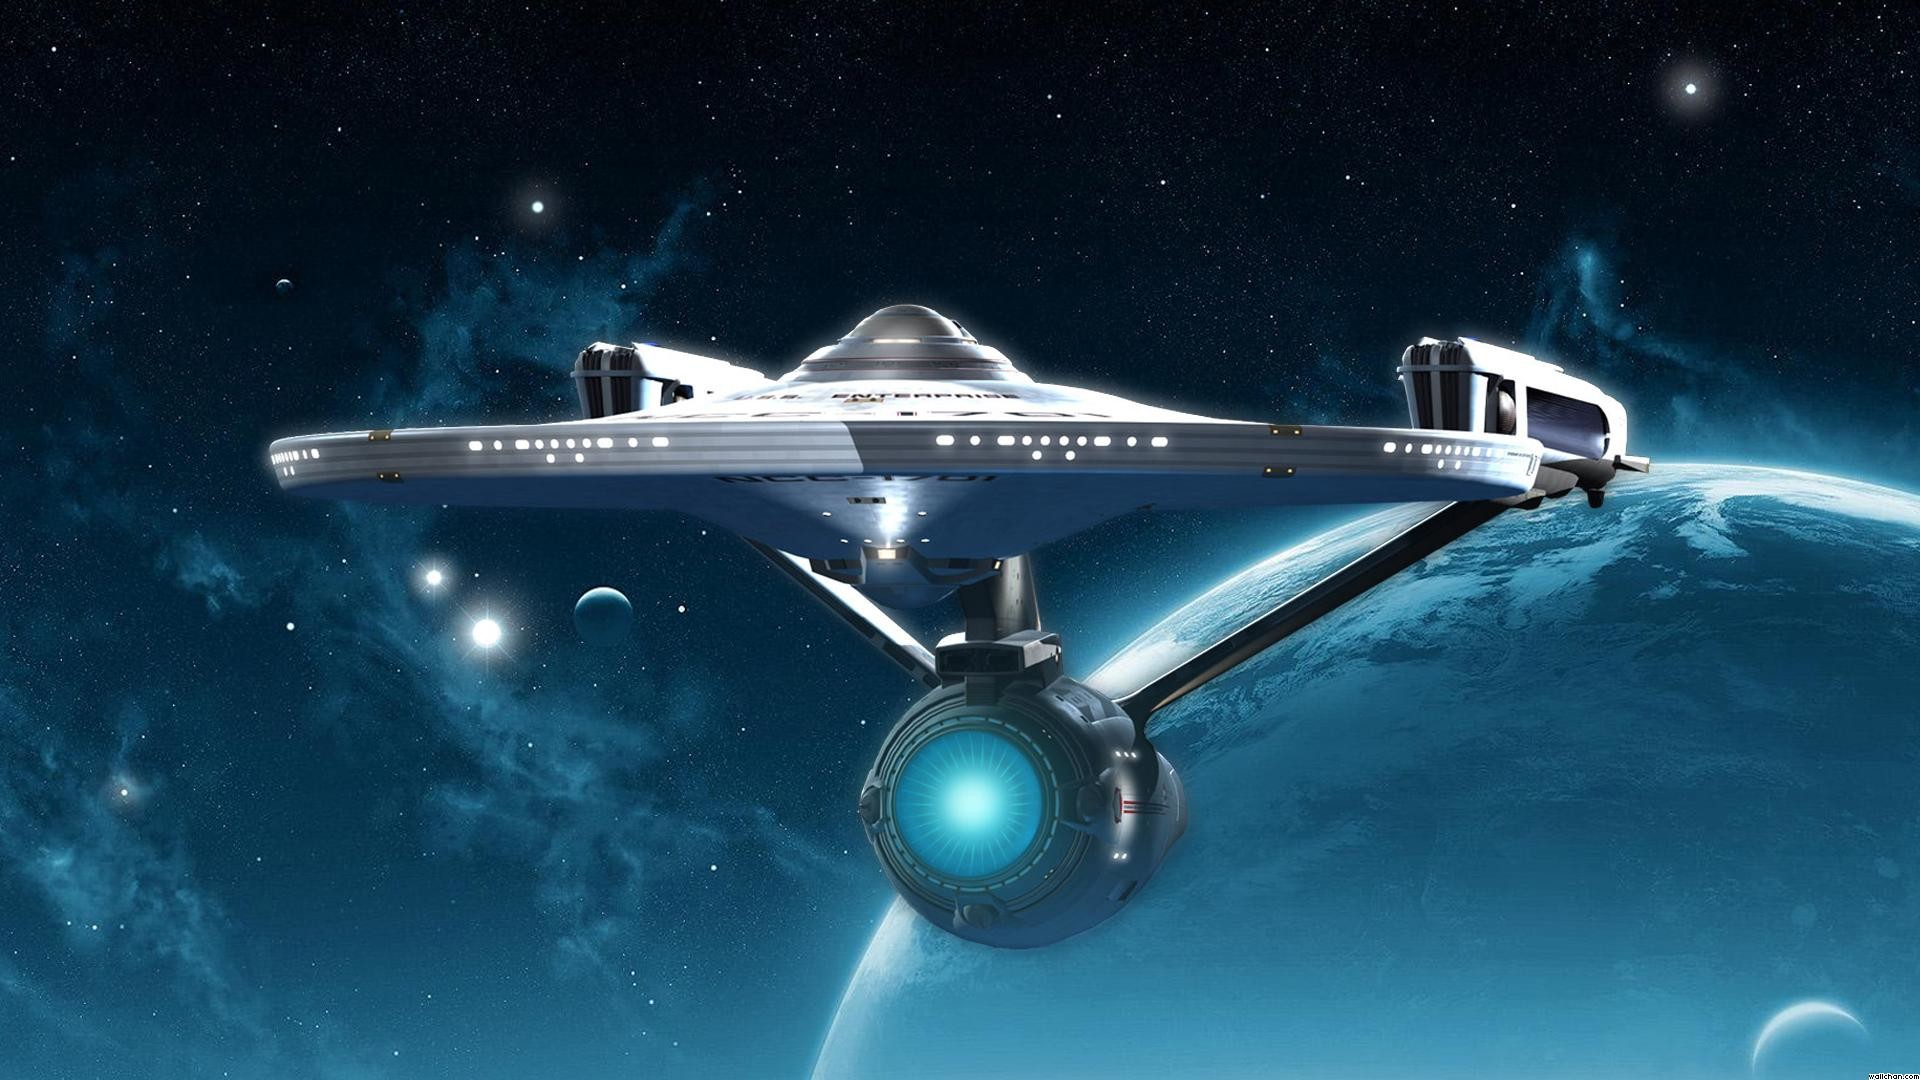 Star Trek Enterprise Wallpaper – Viewing Gallery